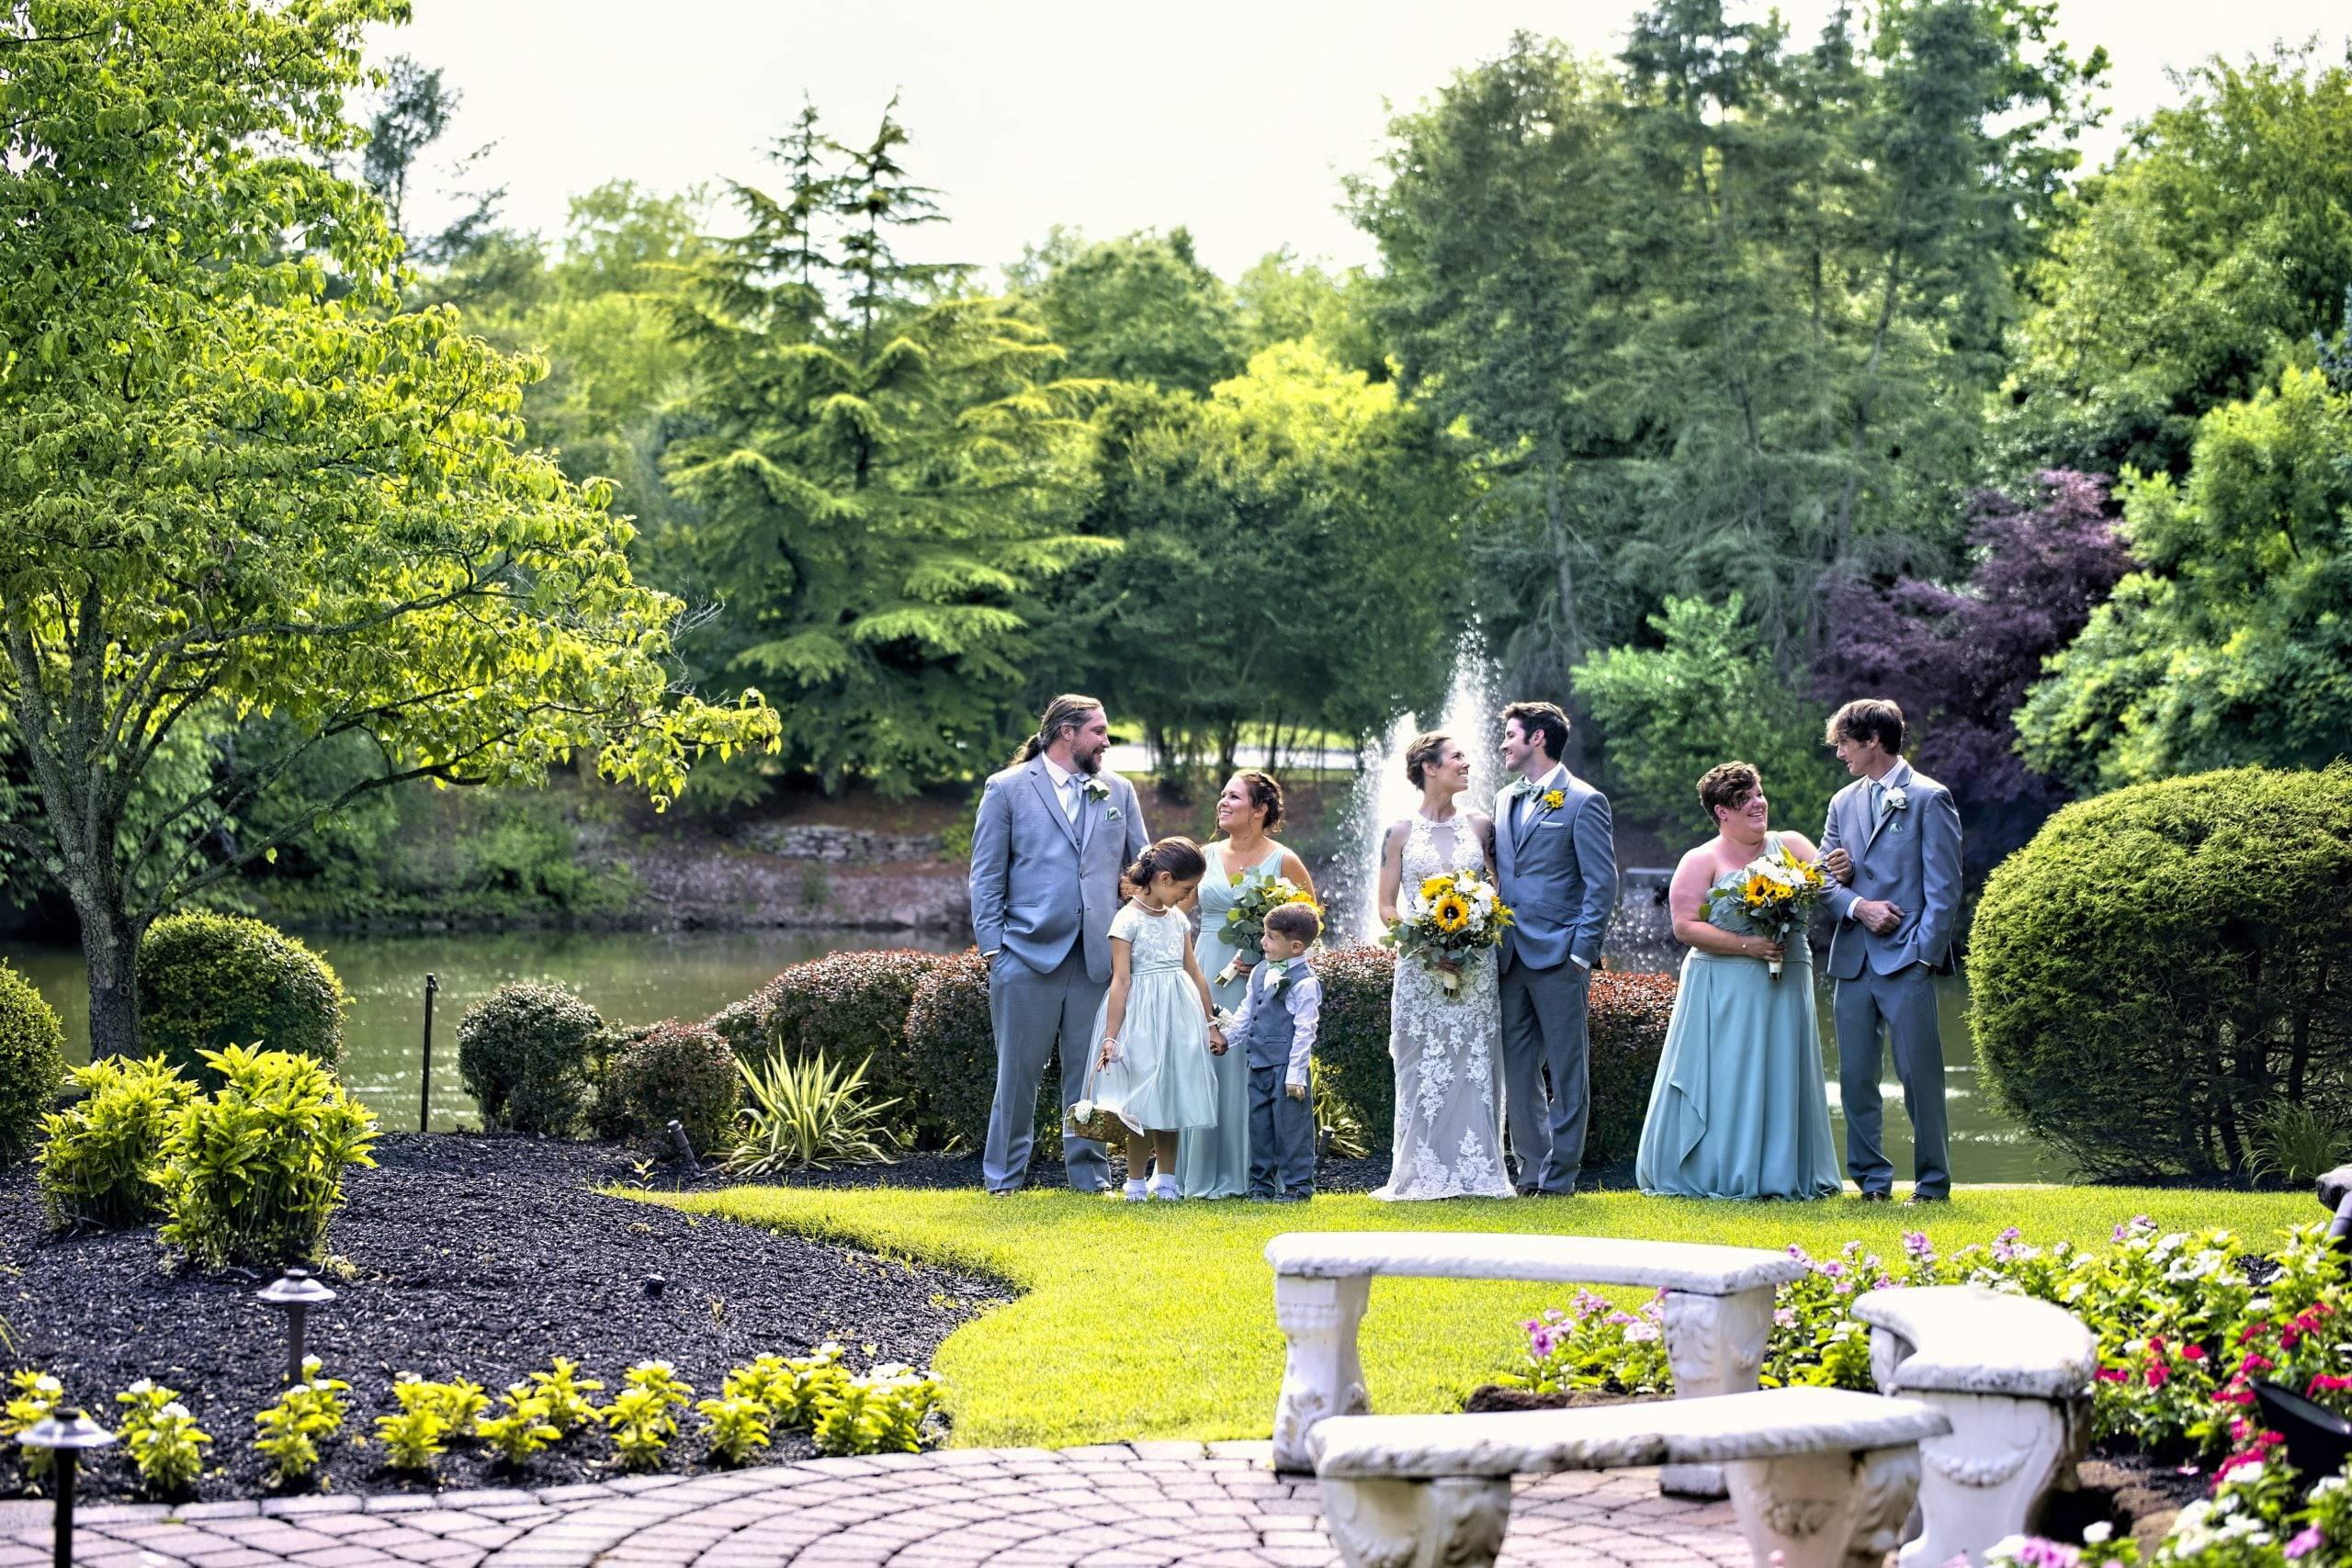 Bridgewater Manor wedding party in gardens by fountain